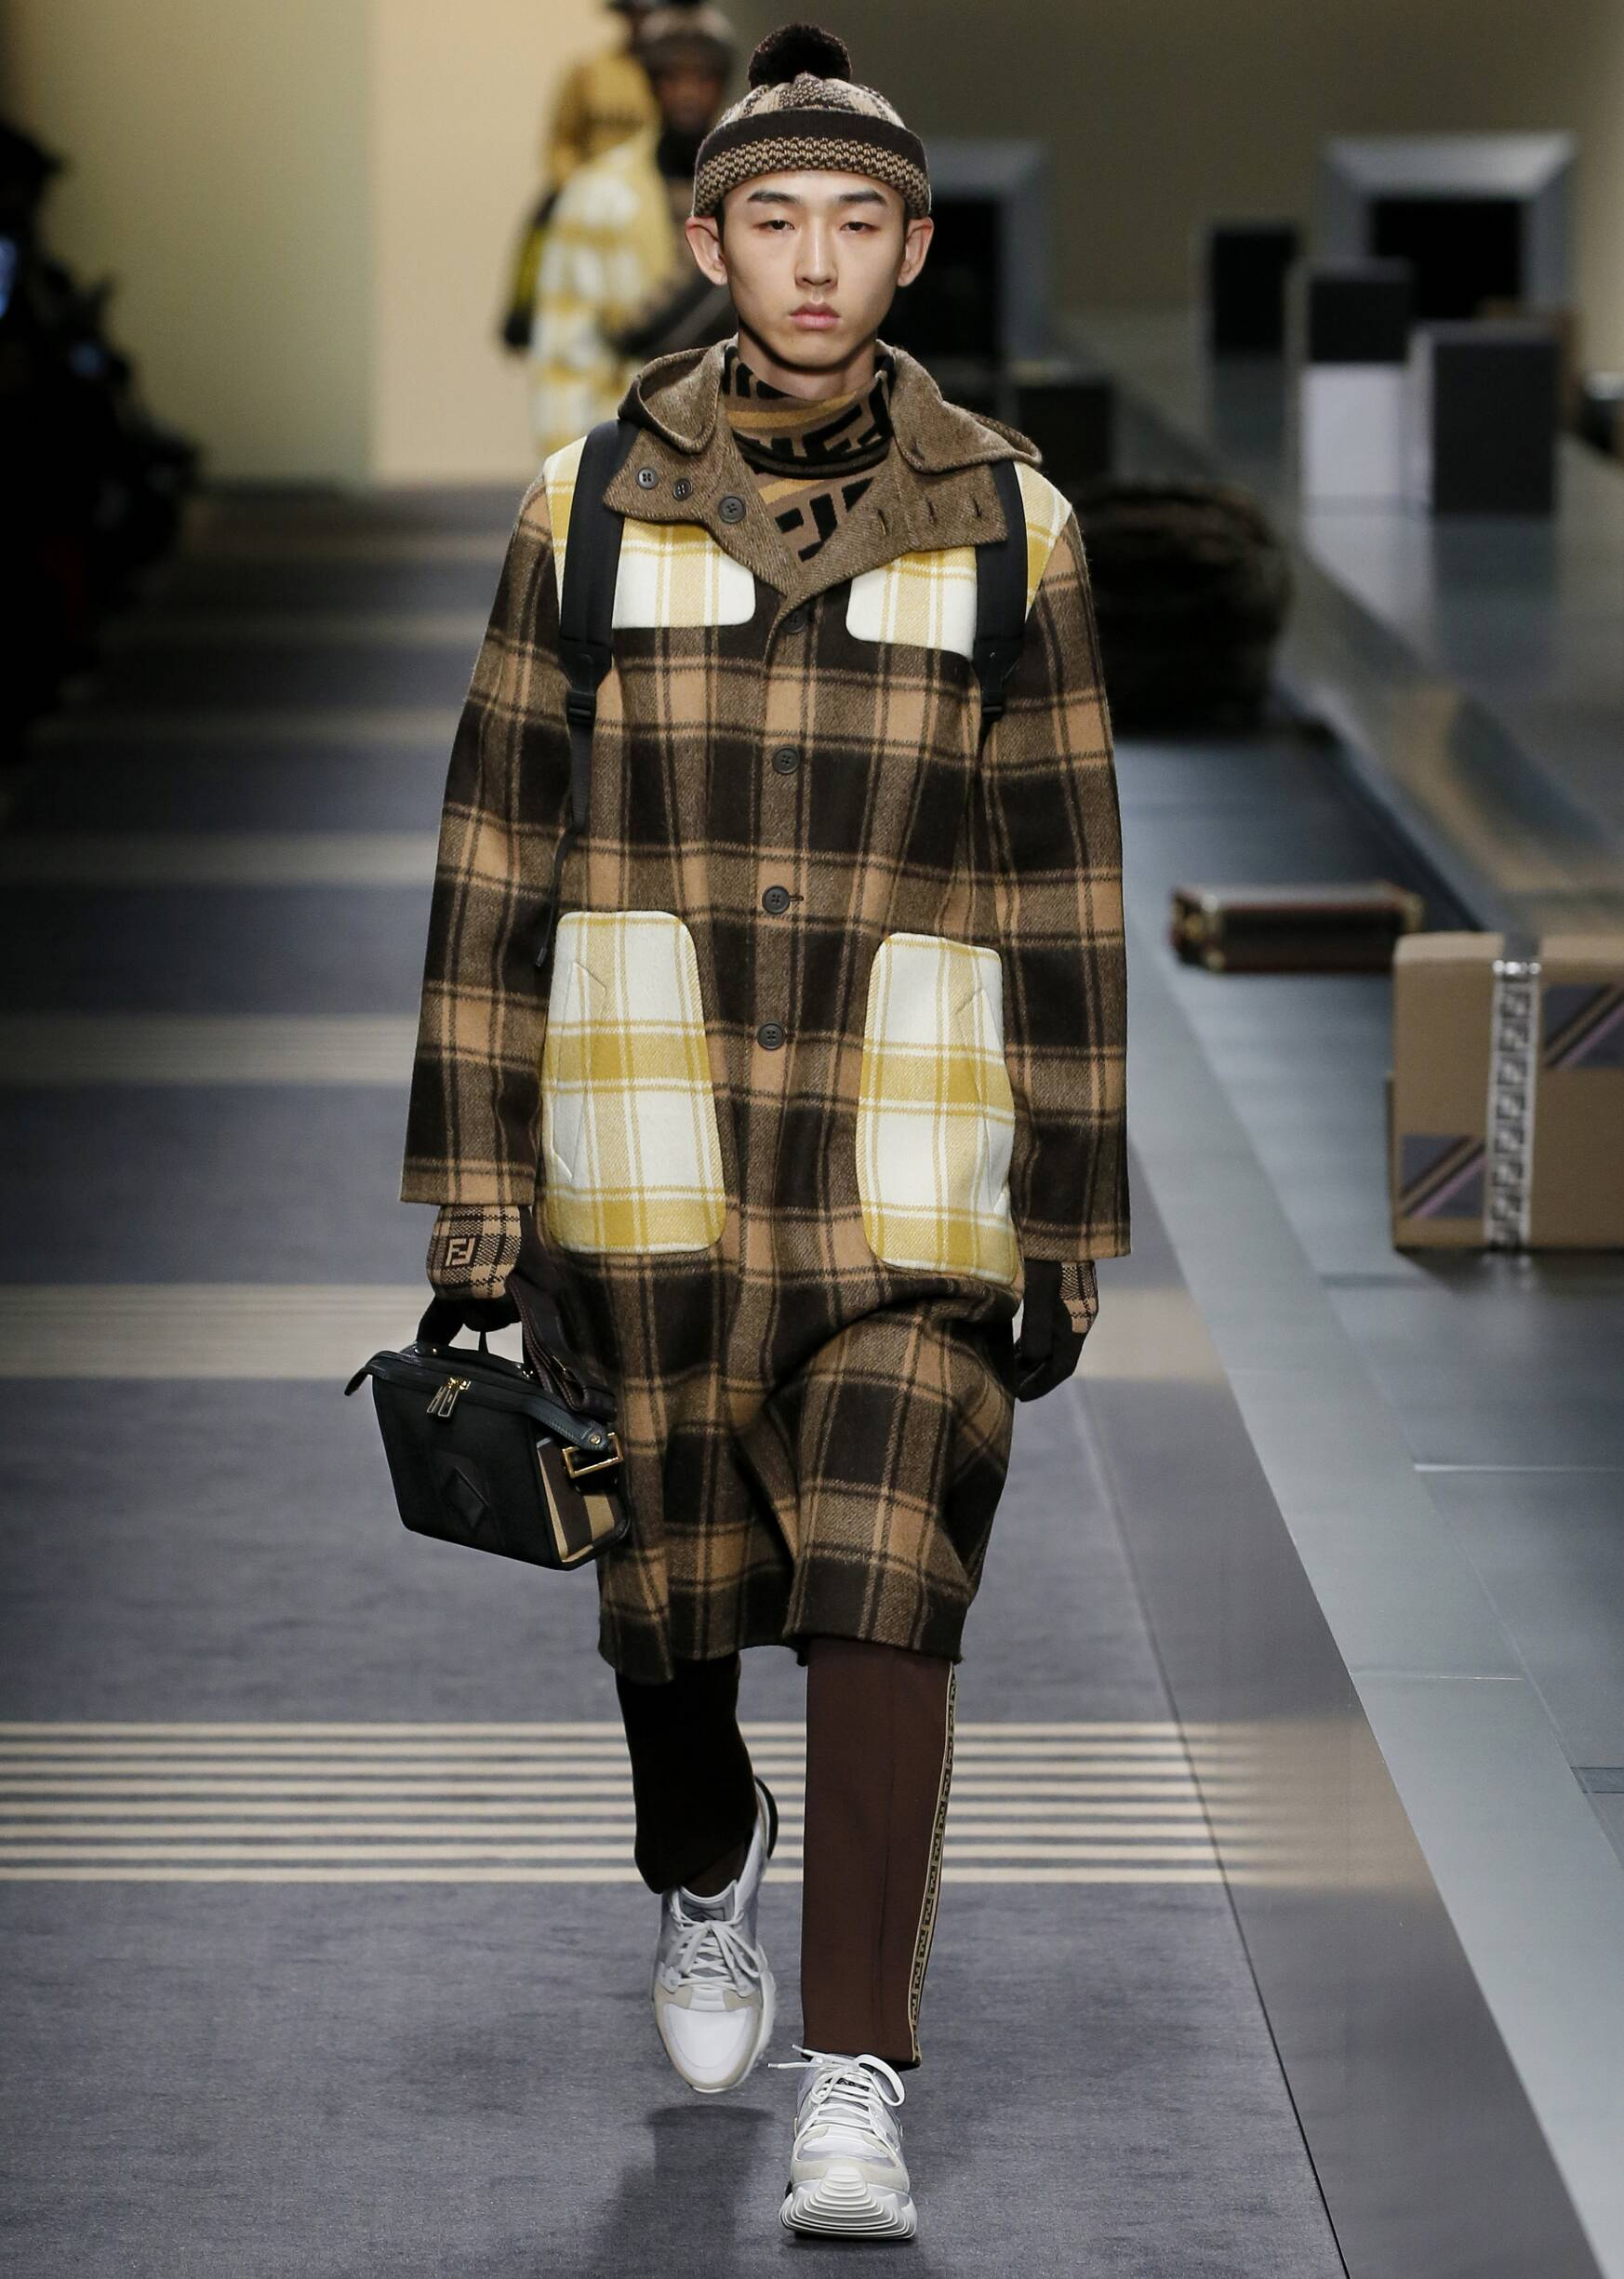 Catwalk Fendi Man Fashion Show Winter 2018